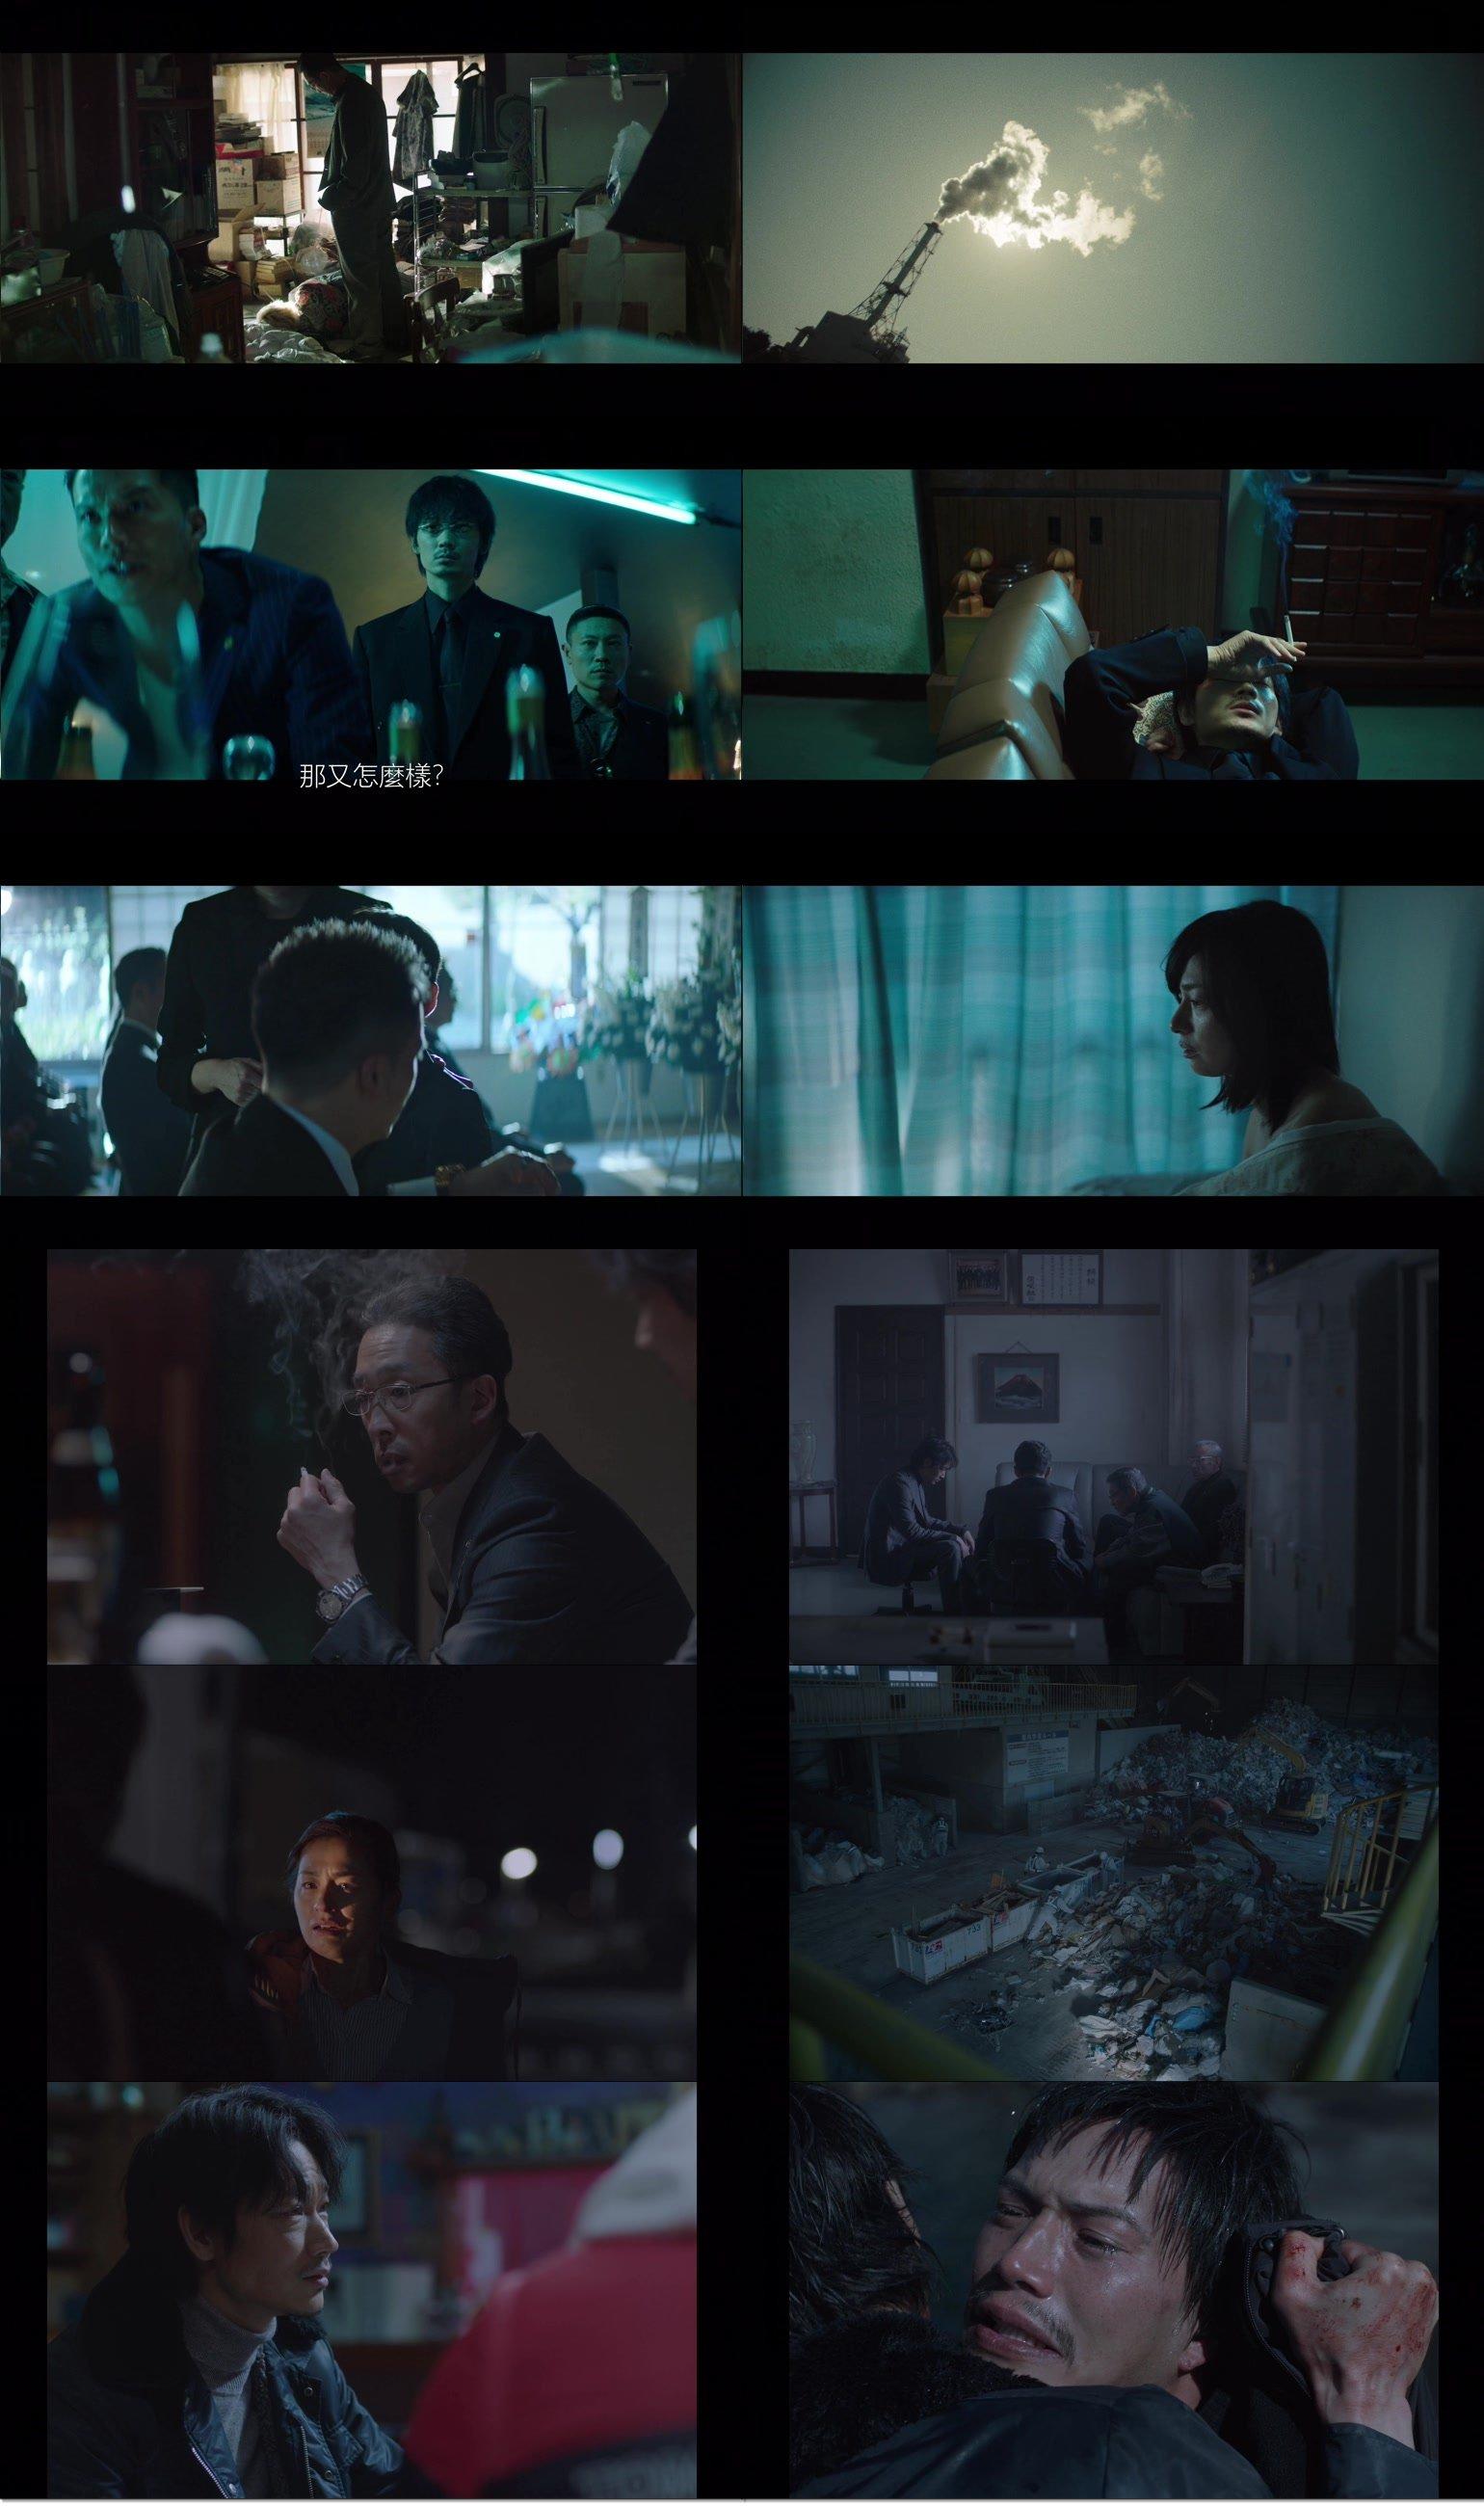 ??????Yakuza.and.the.Family.2021.1080p.NF.WEB-DL.H264.AC3-FEWAT.mkv